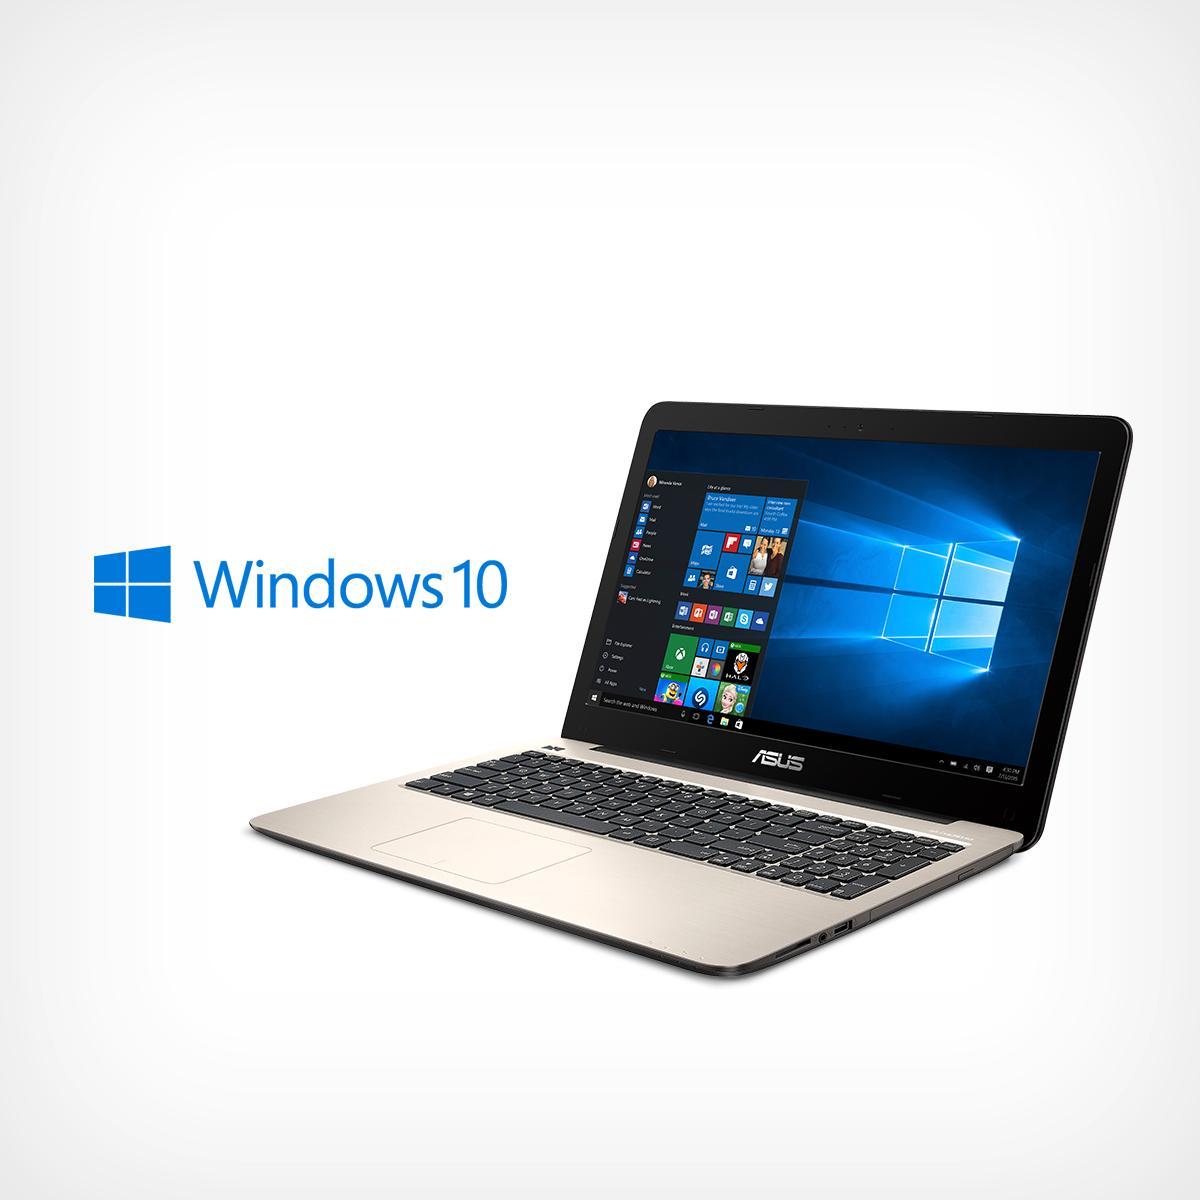 Amazon Com Asus F556ua As54 15 6 Inch Full Hd Laptop